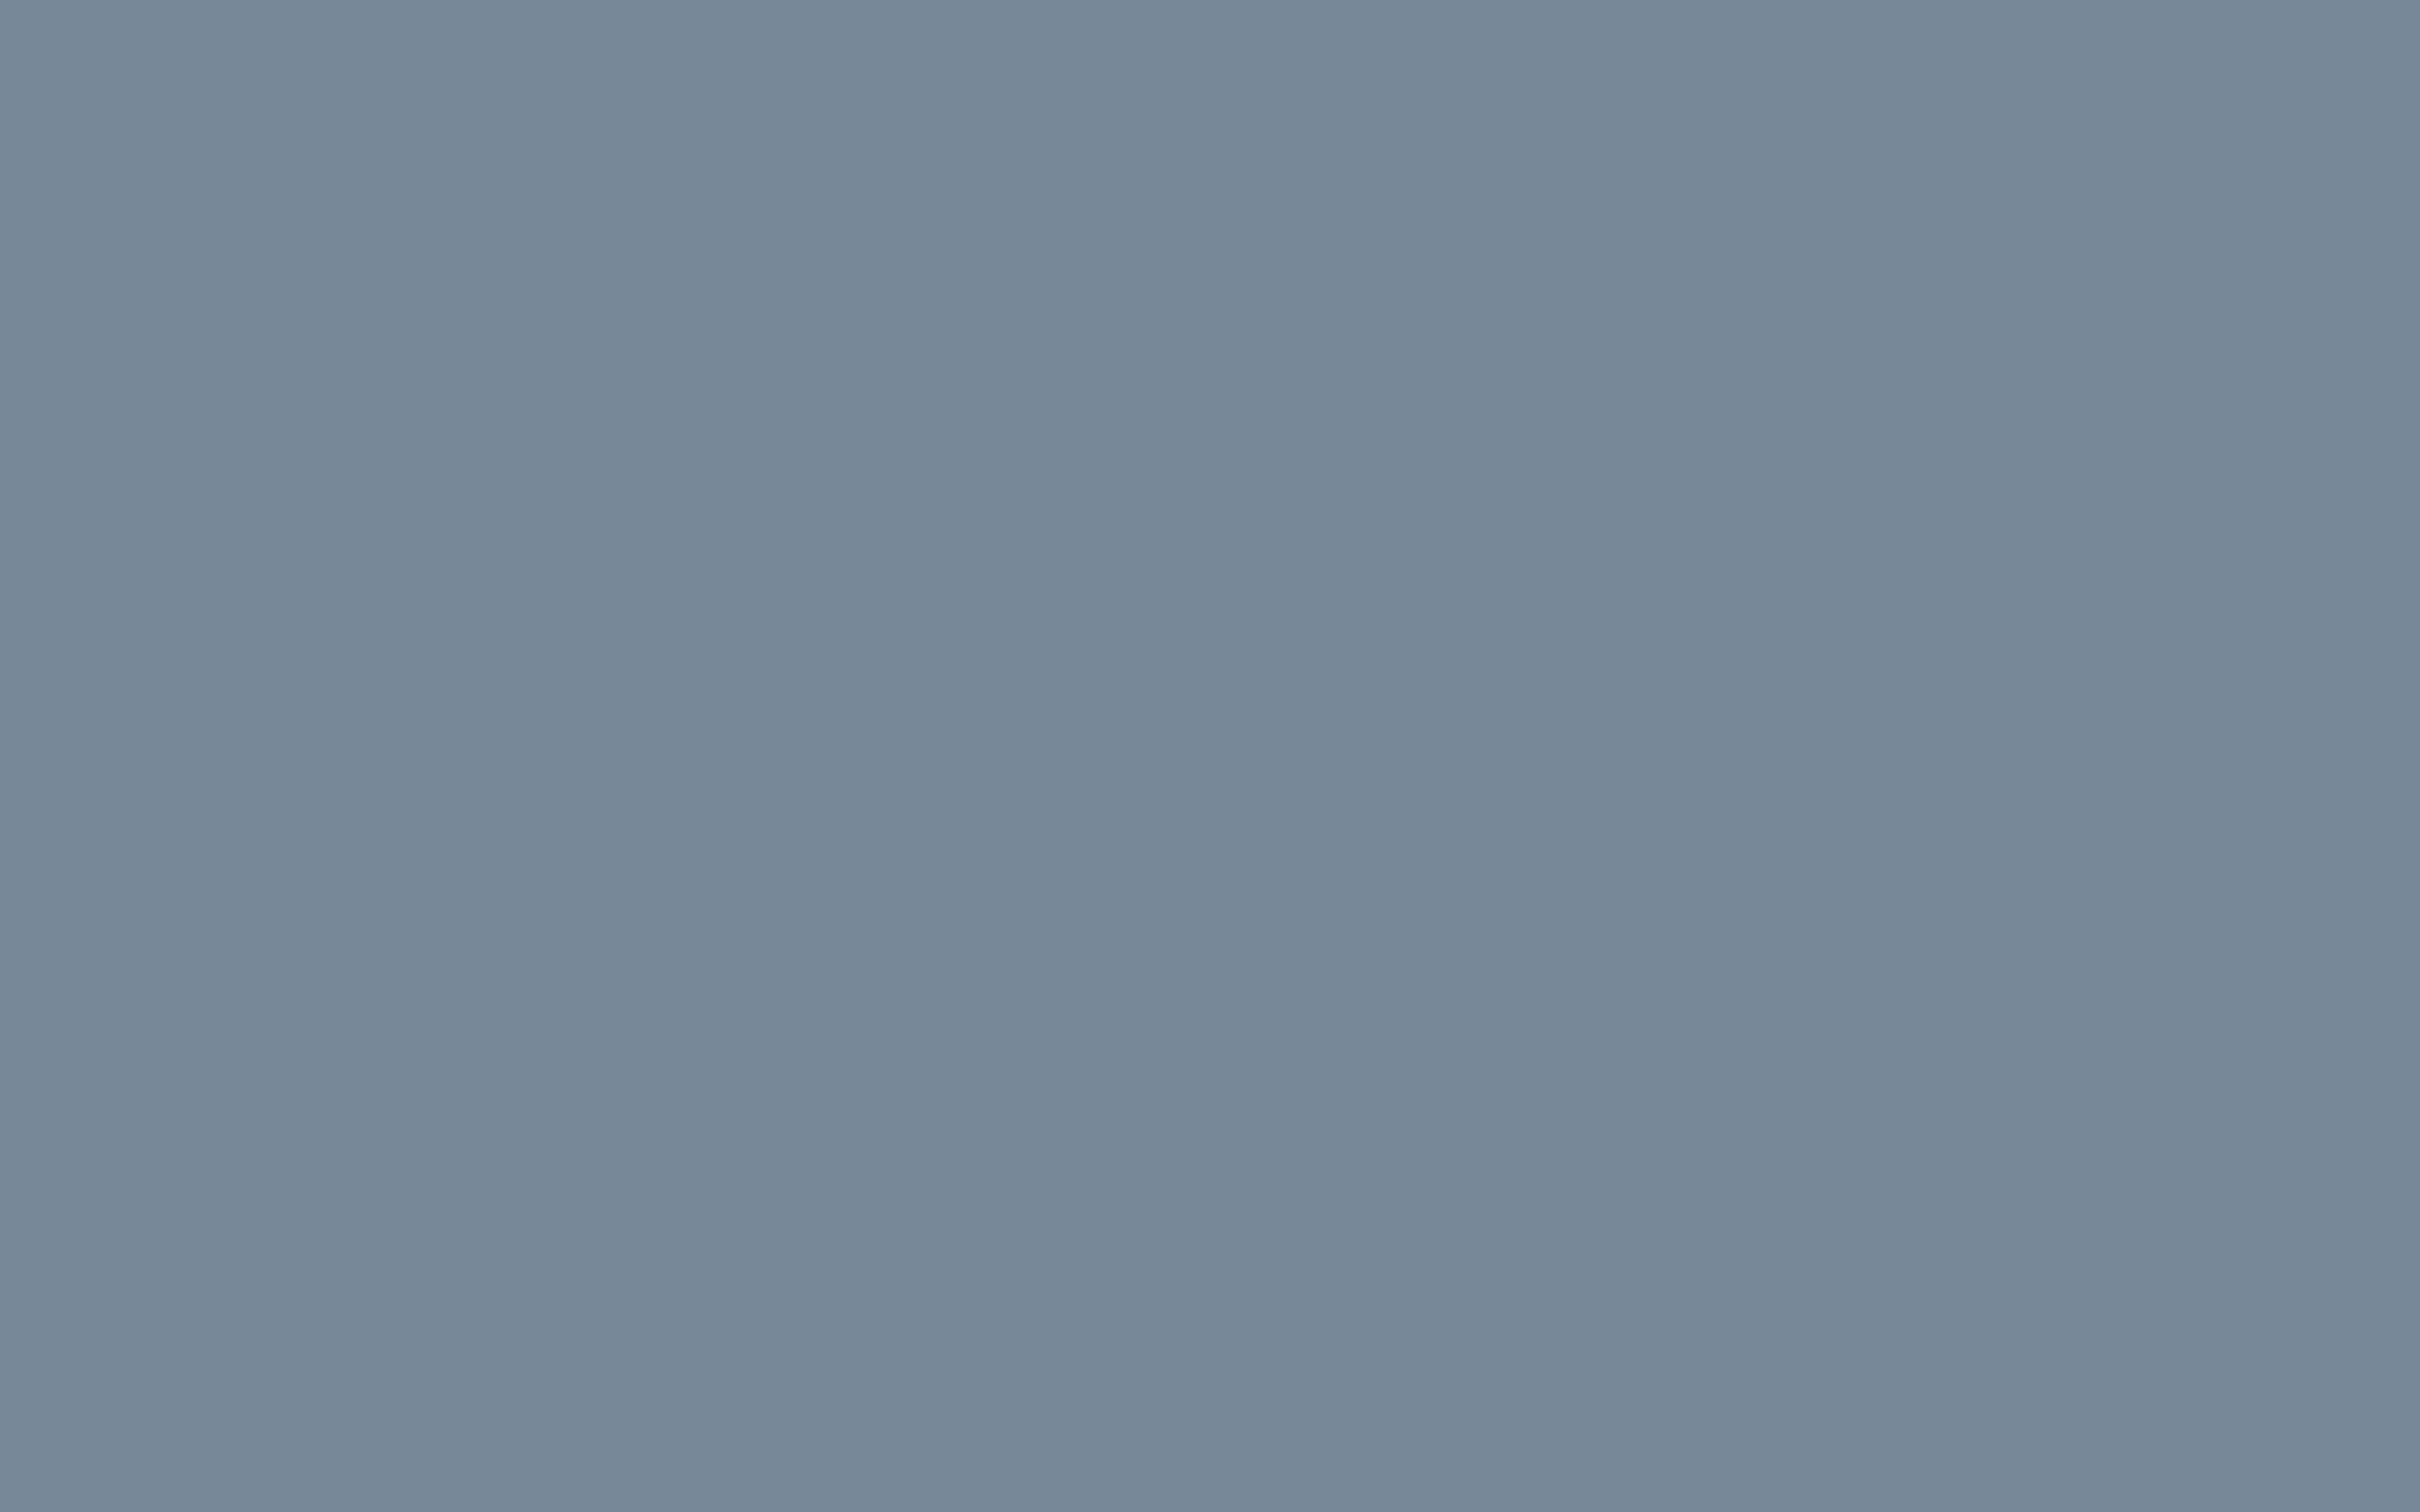 Gray slate wallpaper wallpapersafari - Solid light gray wallpaper ...